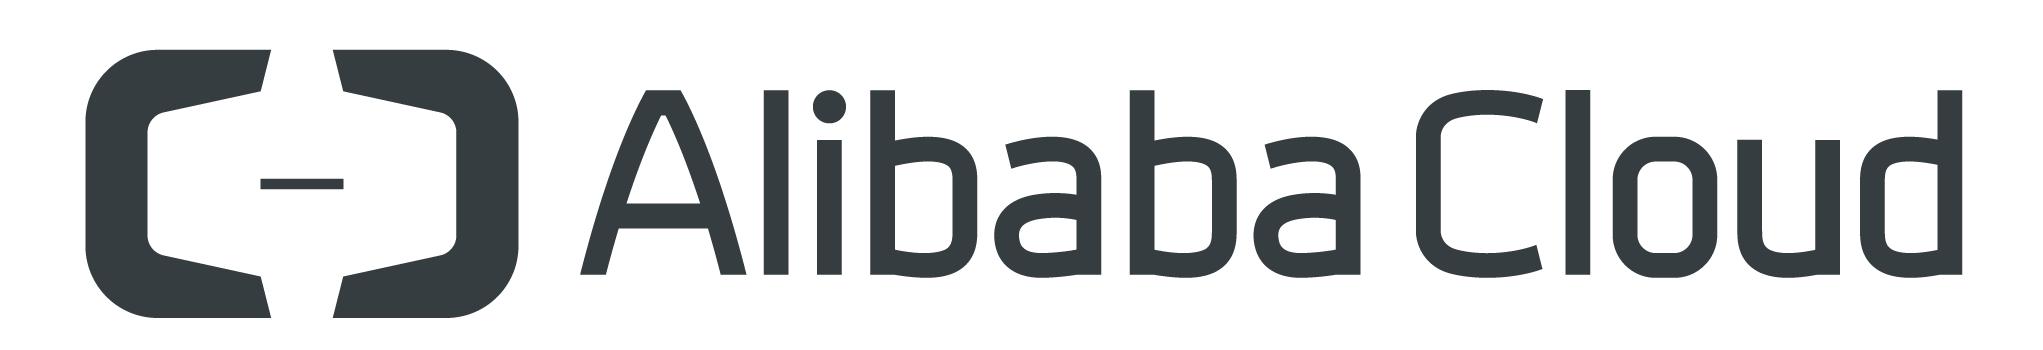 alibaba-cloud_library_logos_aliyun_large